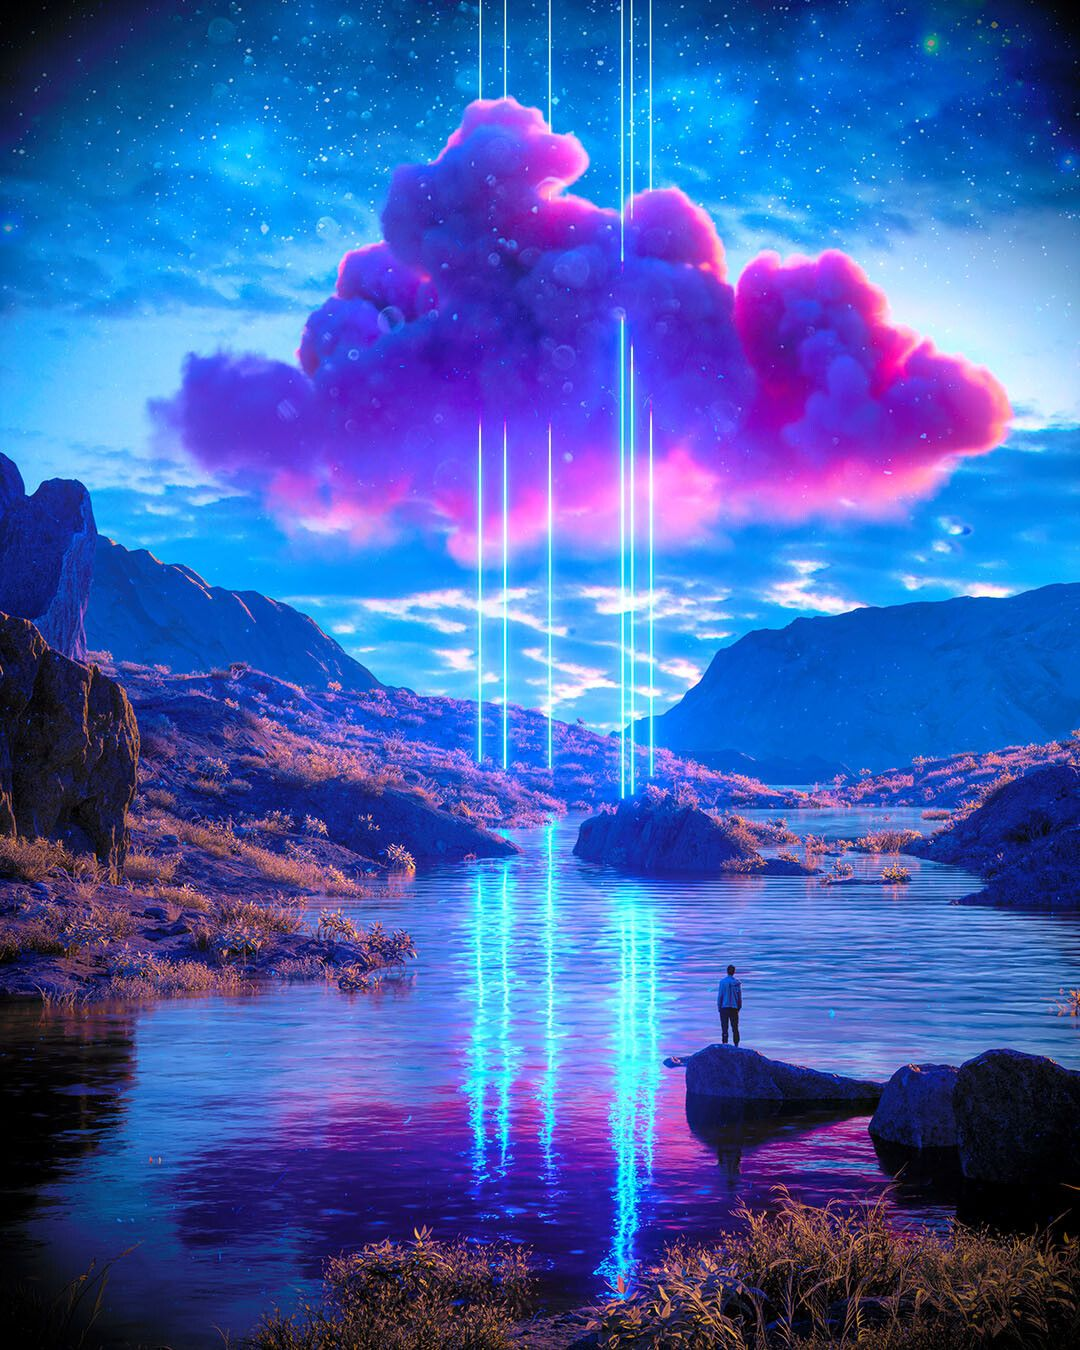 Pink Cloud 3 byJosh Pierce